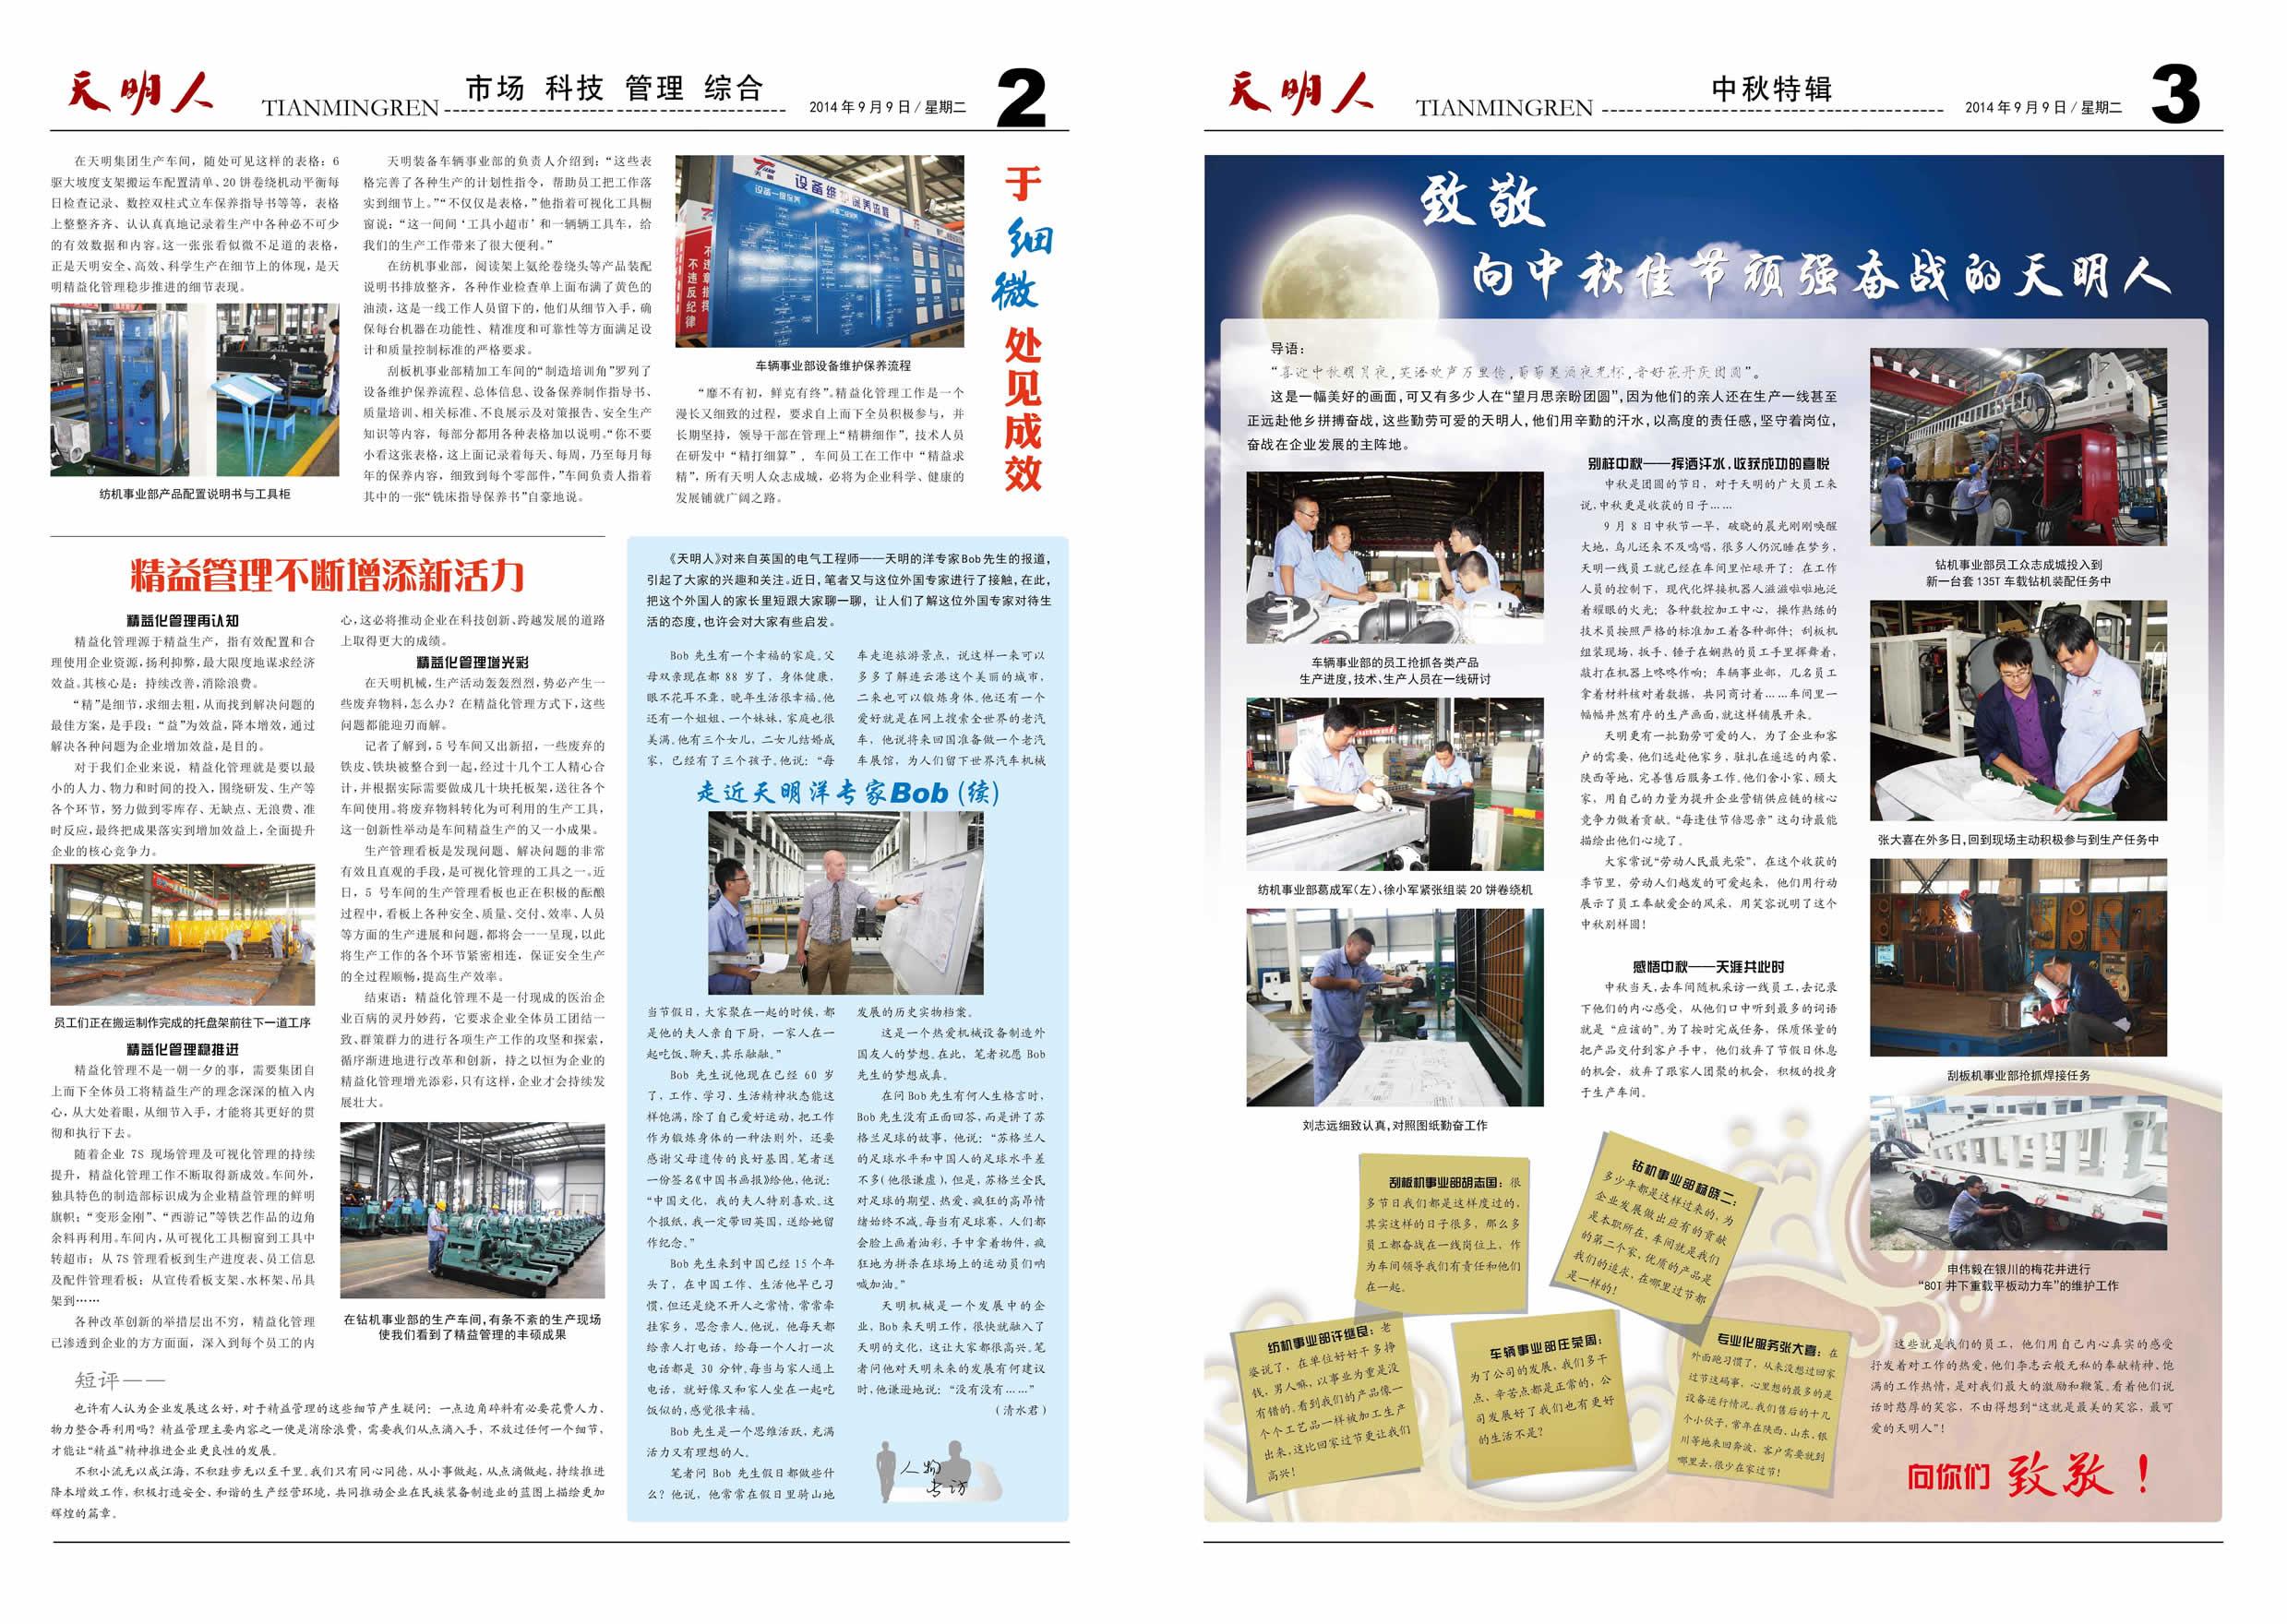 hg711皇冠国际_hg88皇冠国际平台_hg皇冠国际vip首页人2014第09期(总第84期)2、3版